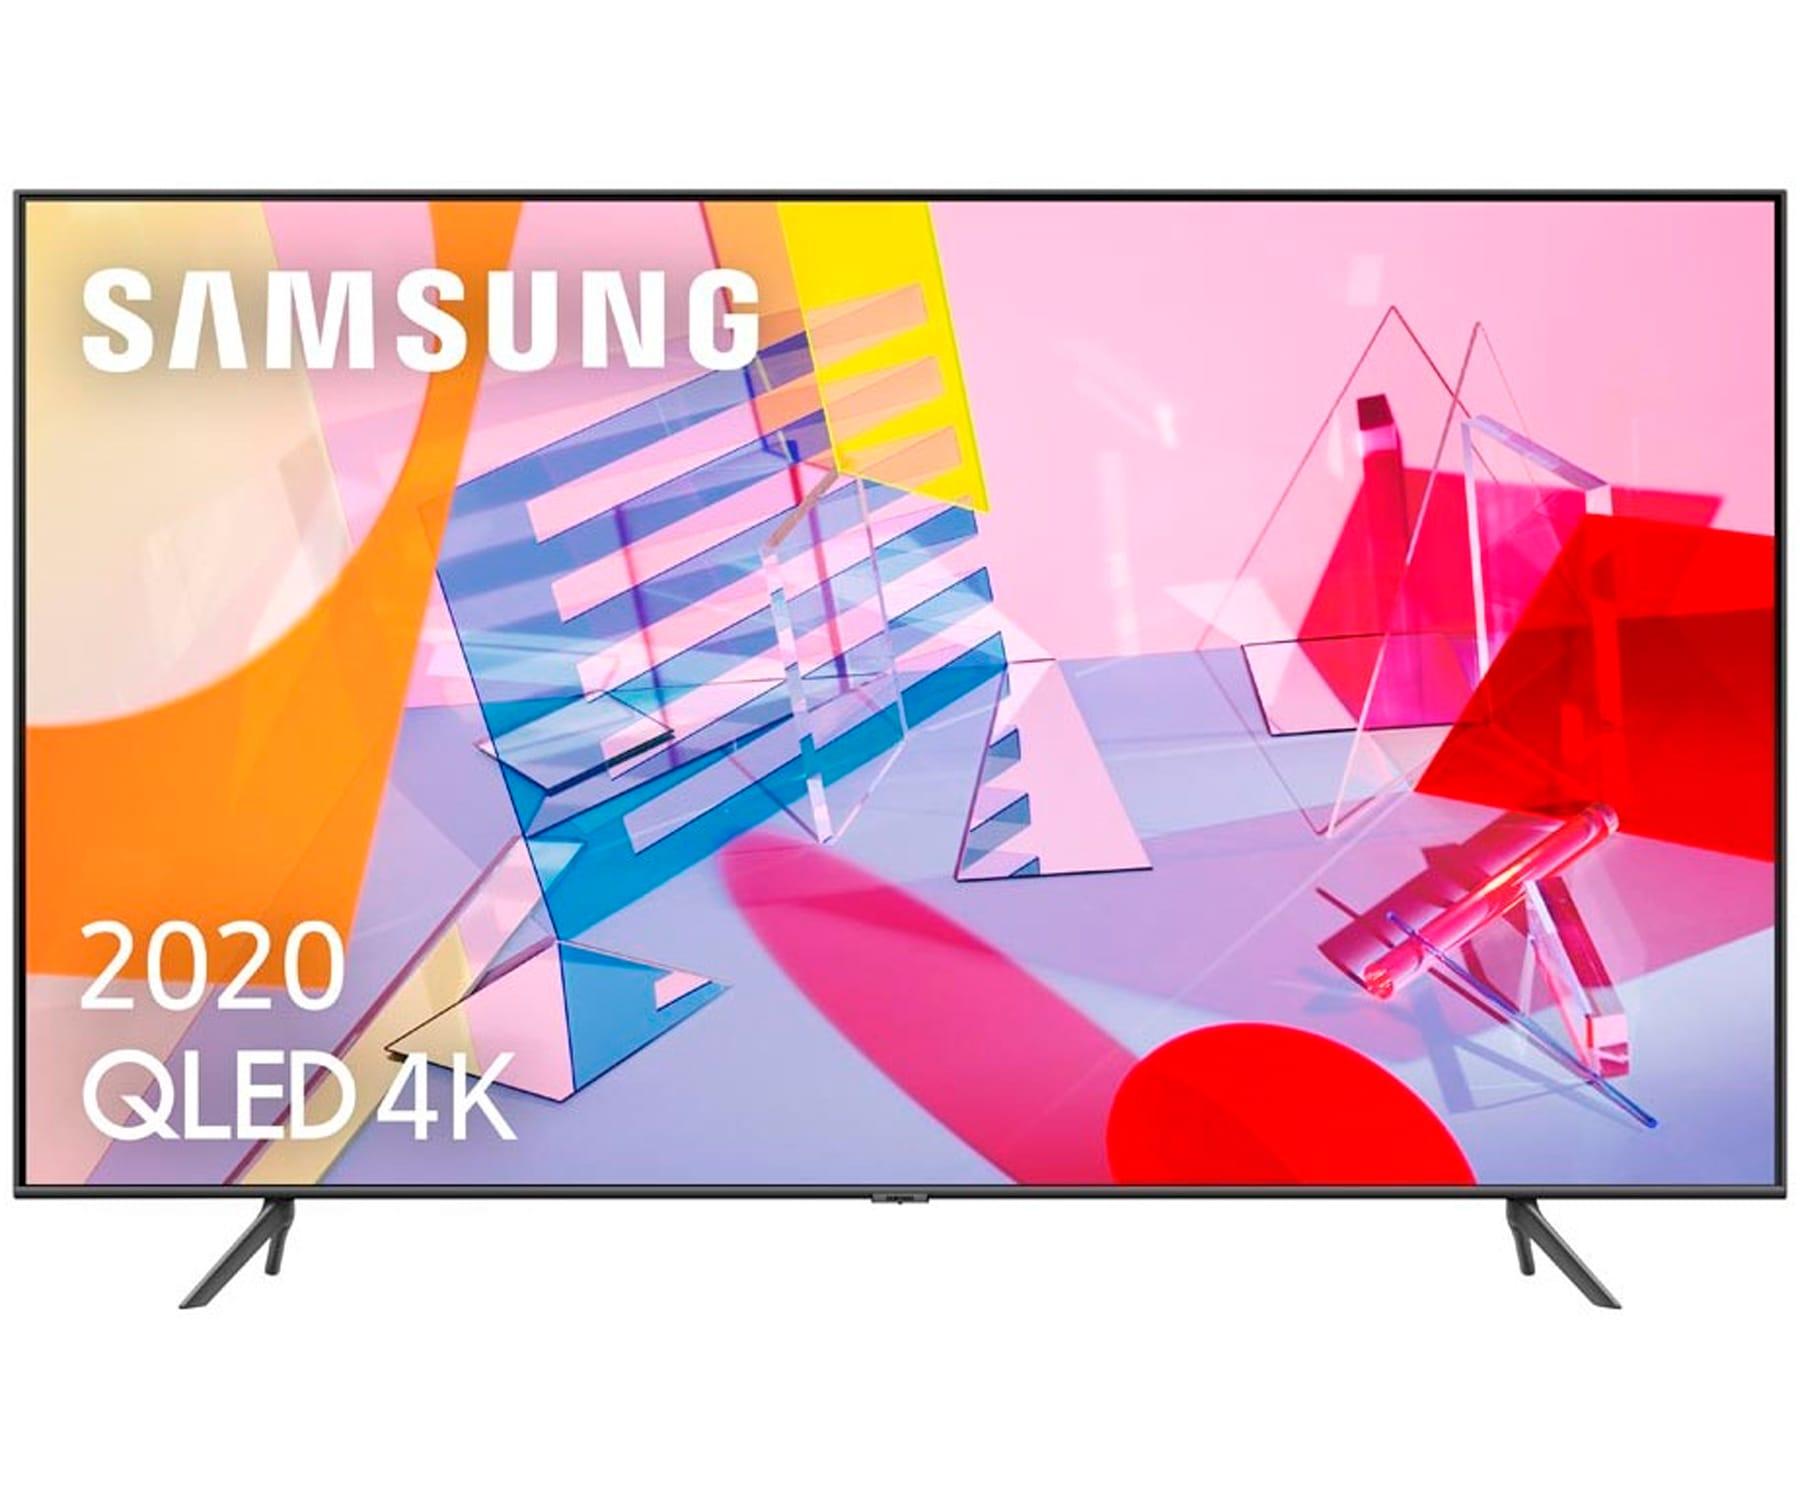 SAMSUNG QE75Q60T 2020 TELEVISOR 75'' QLED 4K QUANTUM HDR SMART TV 3100HZ PQI